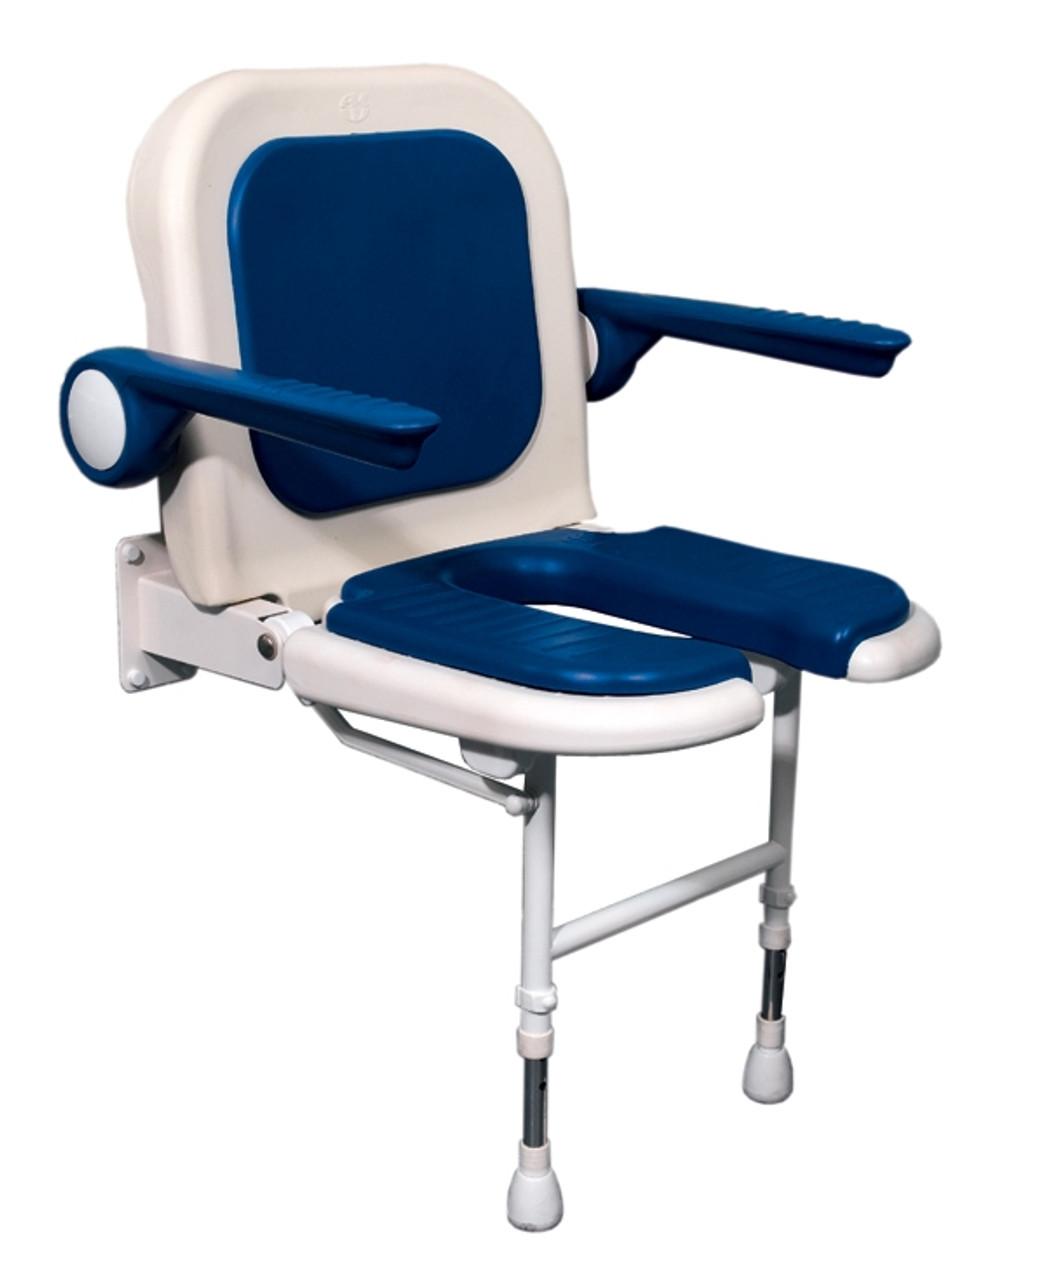 Fold Up Shower Seat Hygiene Cut Out - CareProdx